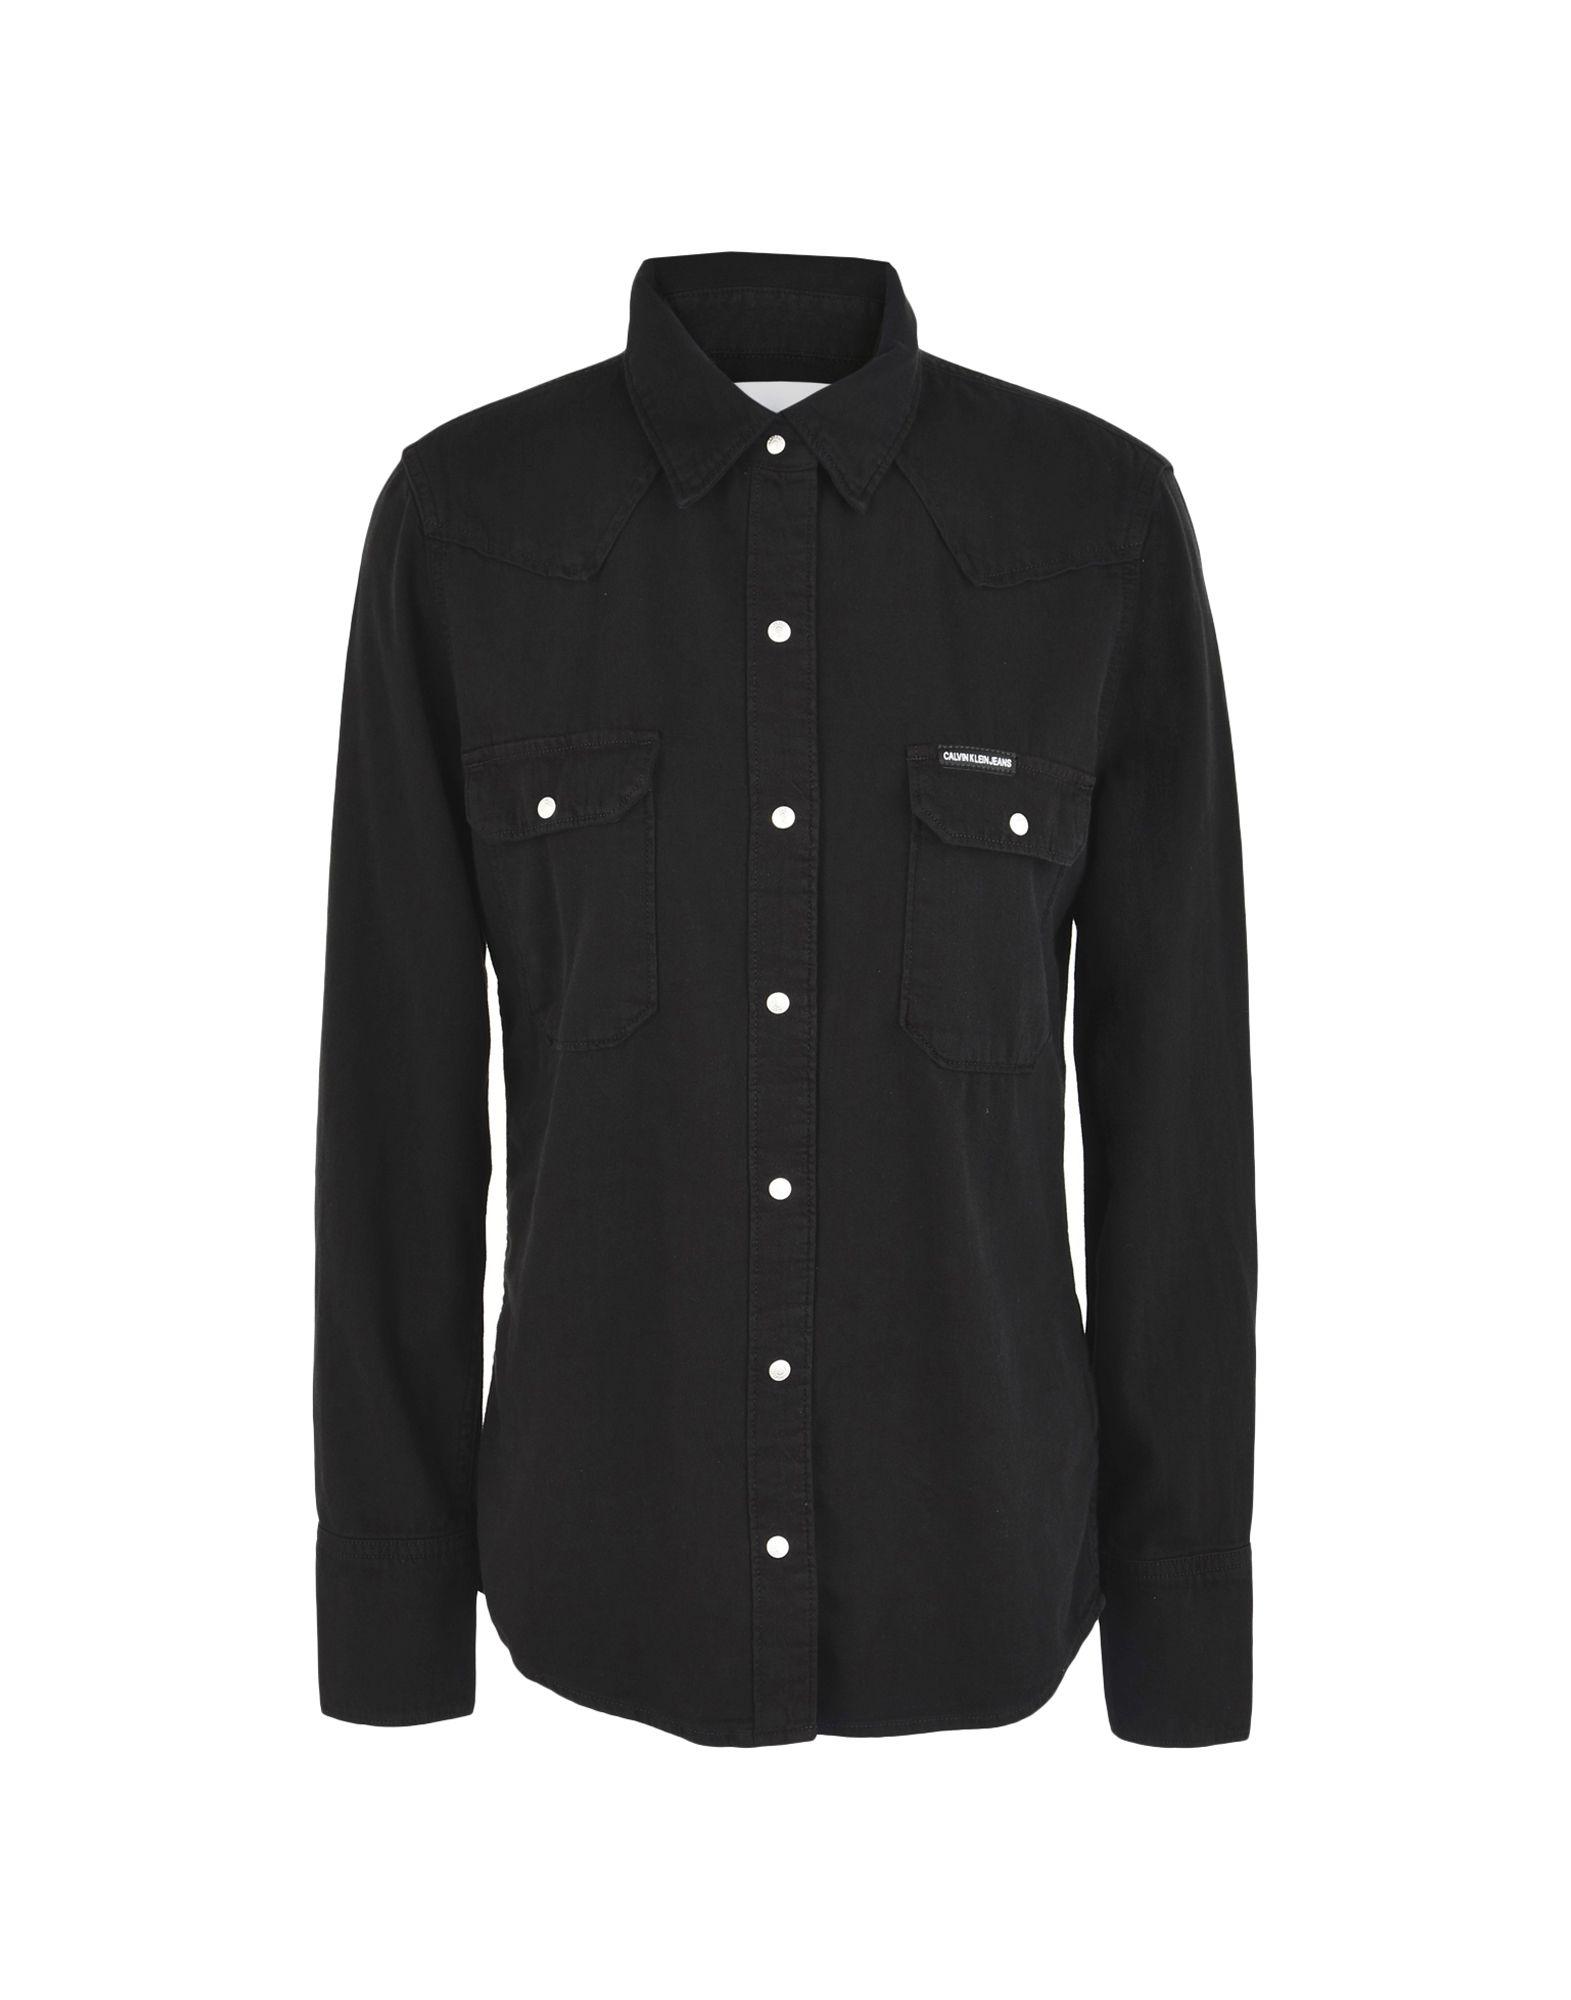 CALVIN KLEIN JEANS Джинсовая рубашка цена 2017